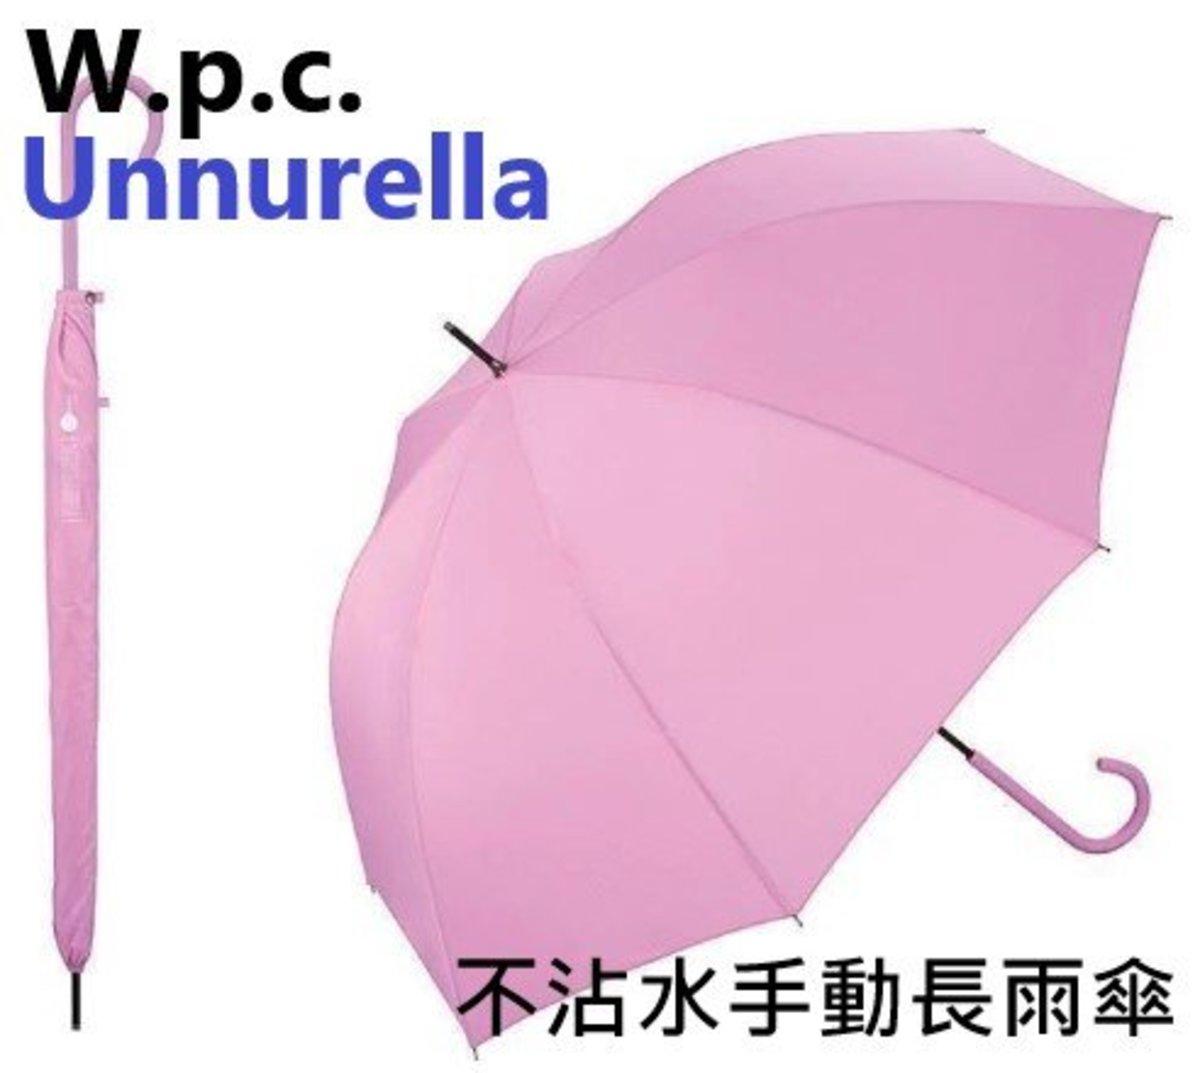 (UN-1006) Unnurella Long water resistance umbrella - Pink